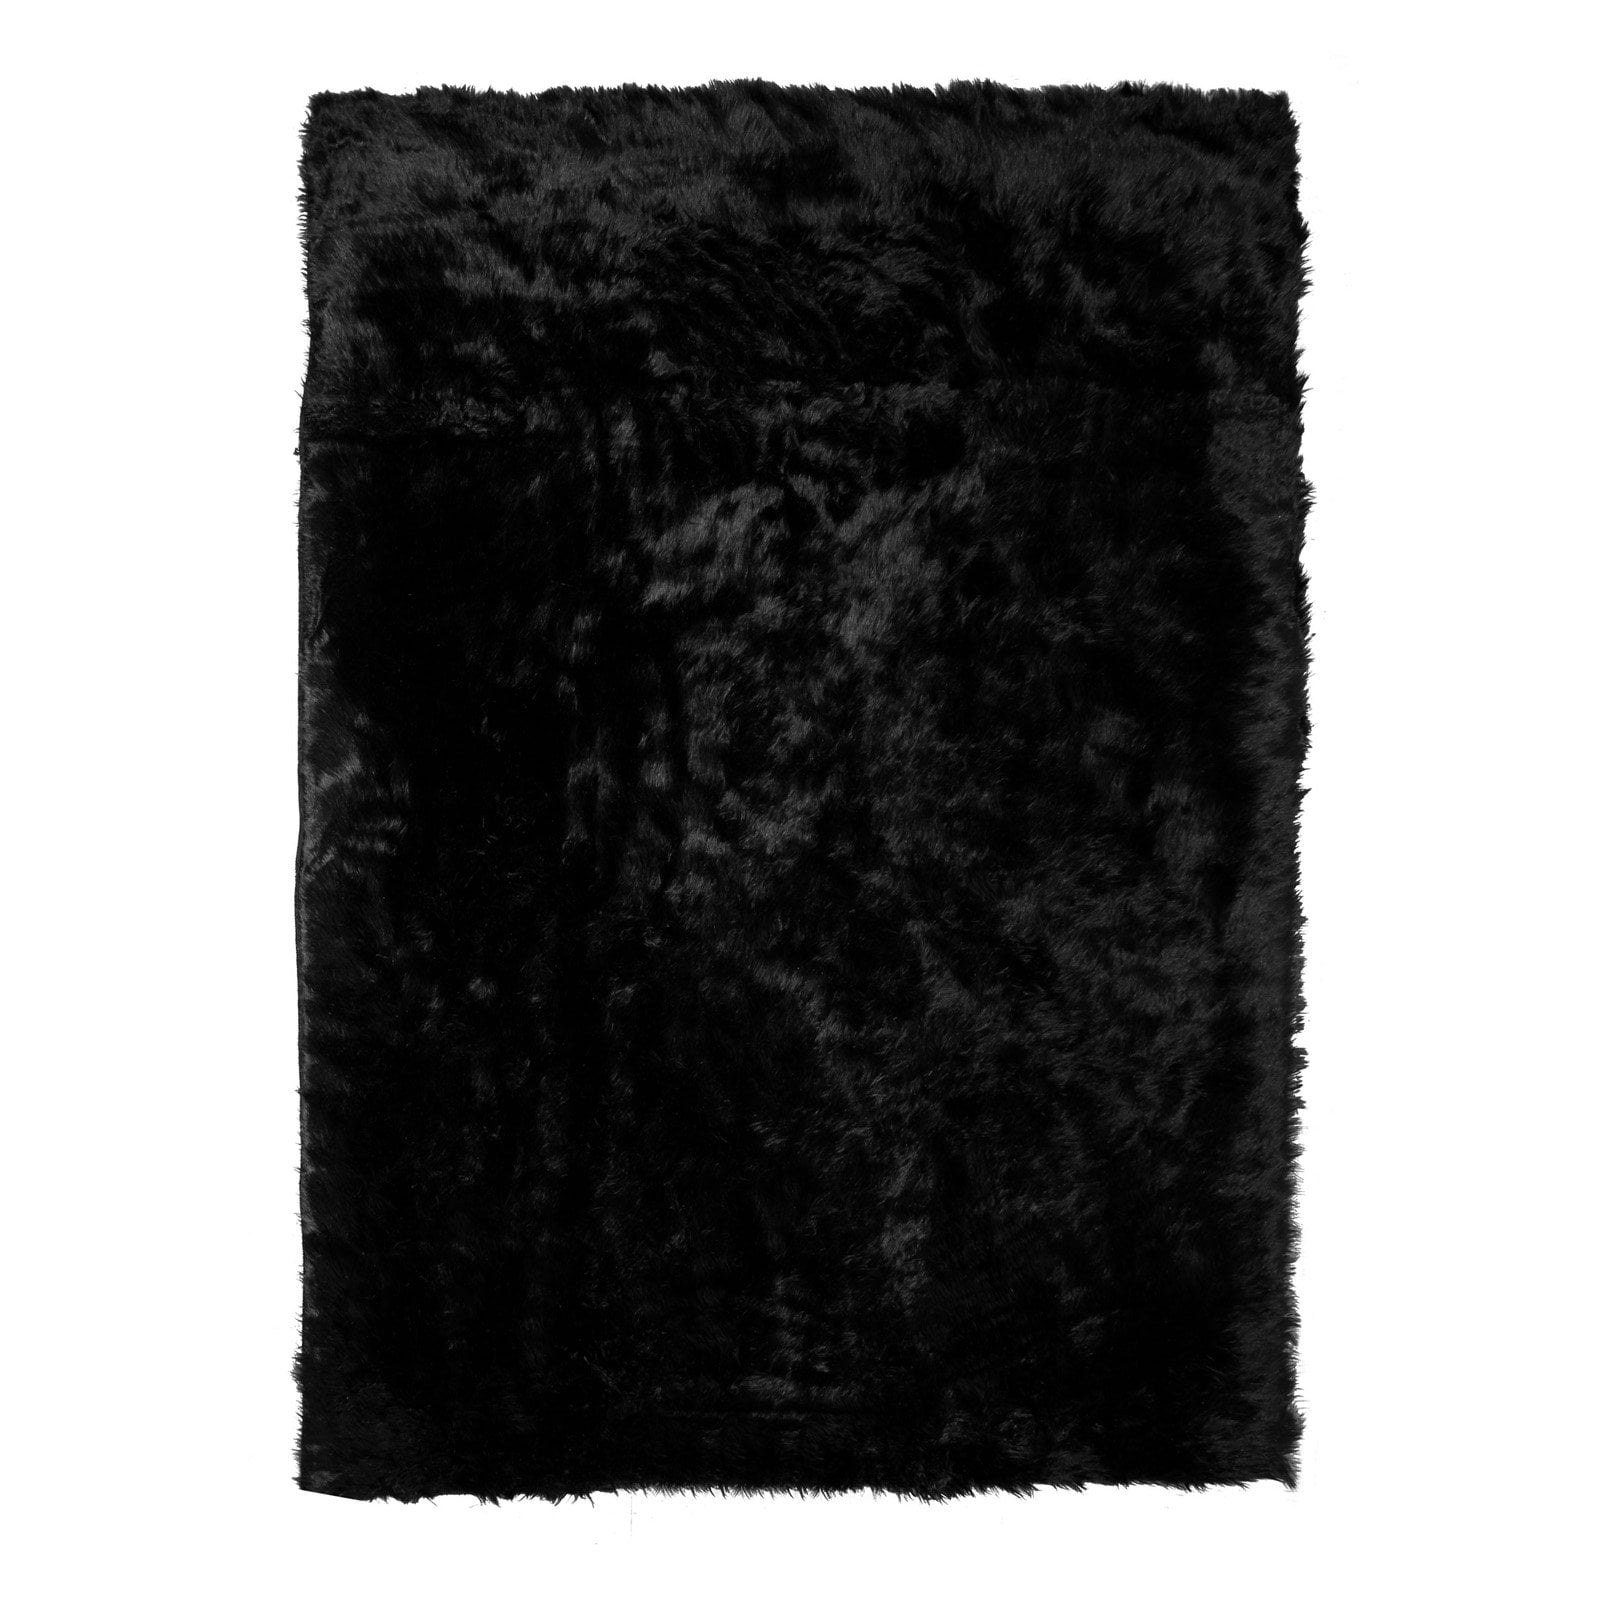 Ailis Faux Sheepskin Fur Area Rug Black Rectangular 7x5 by Glamour Home